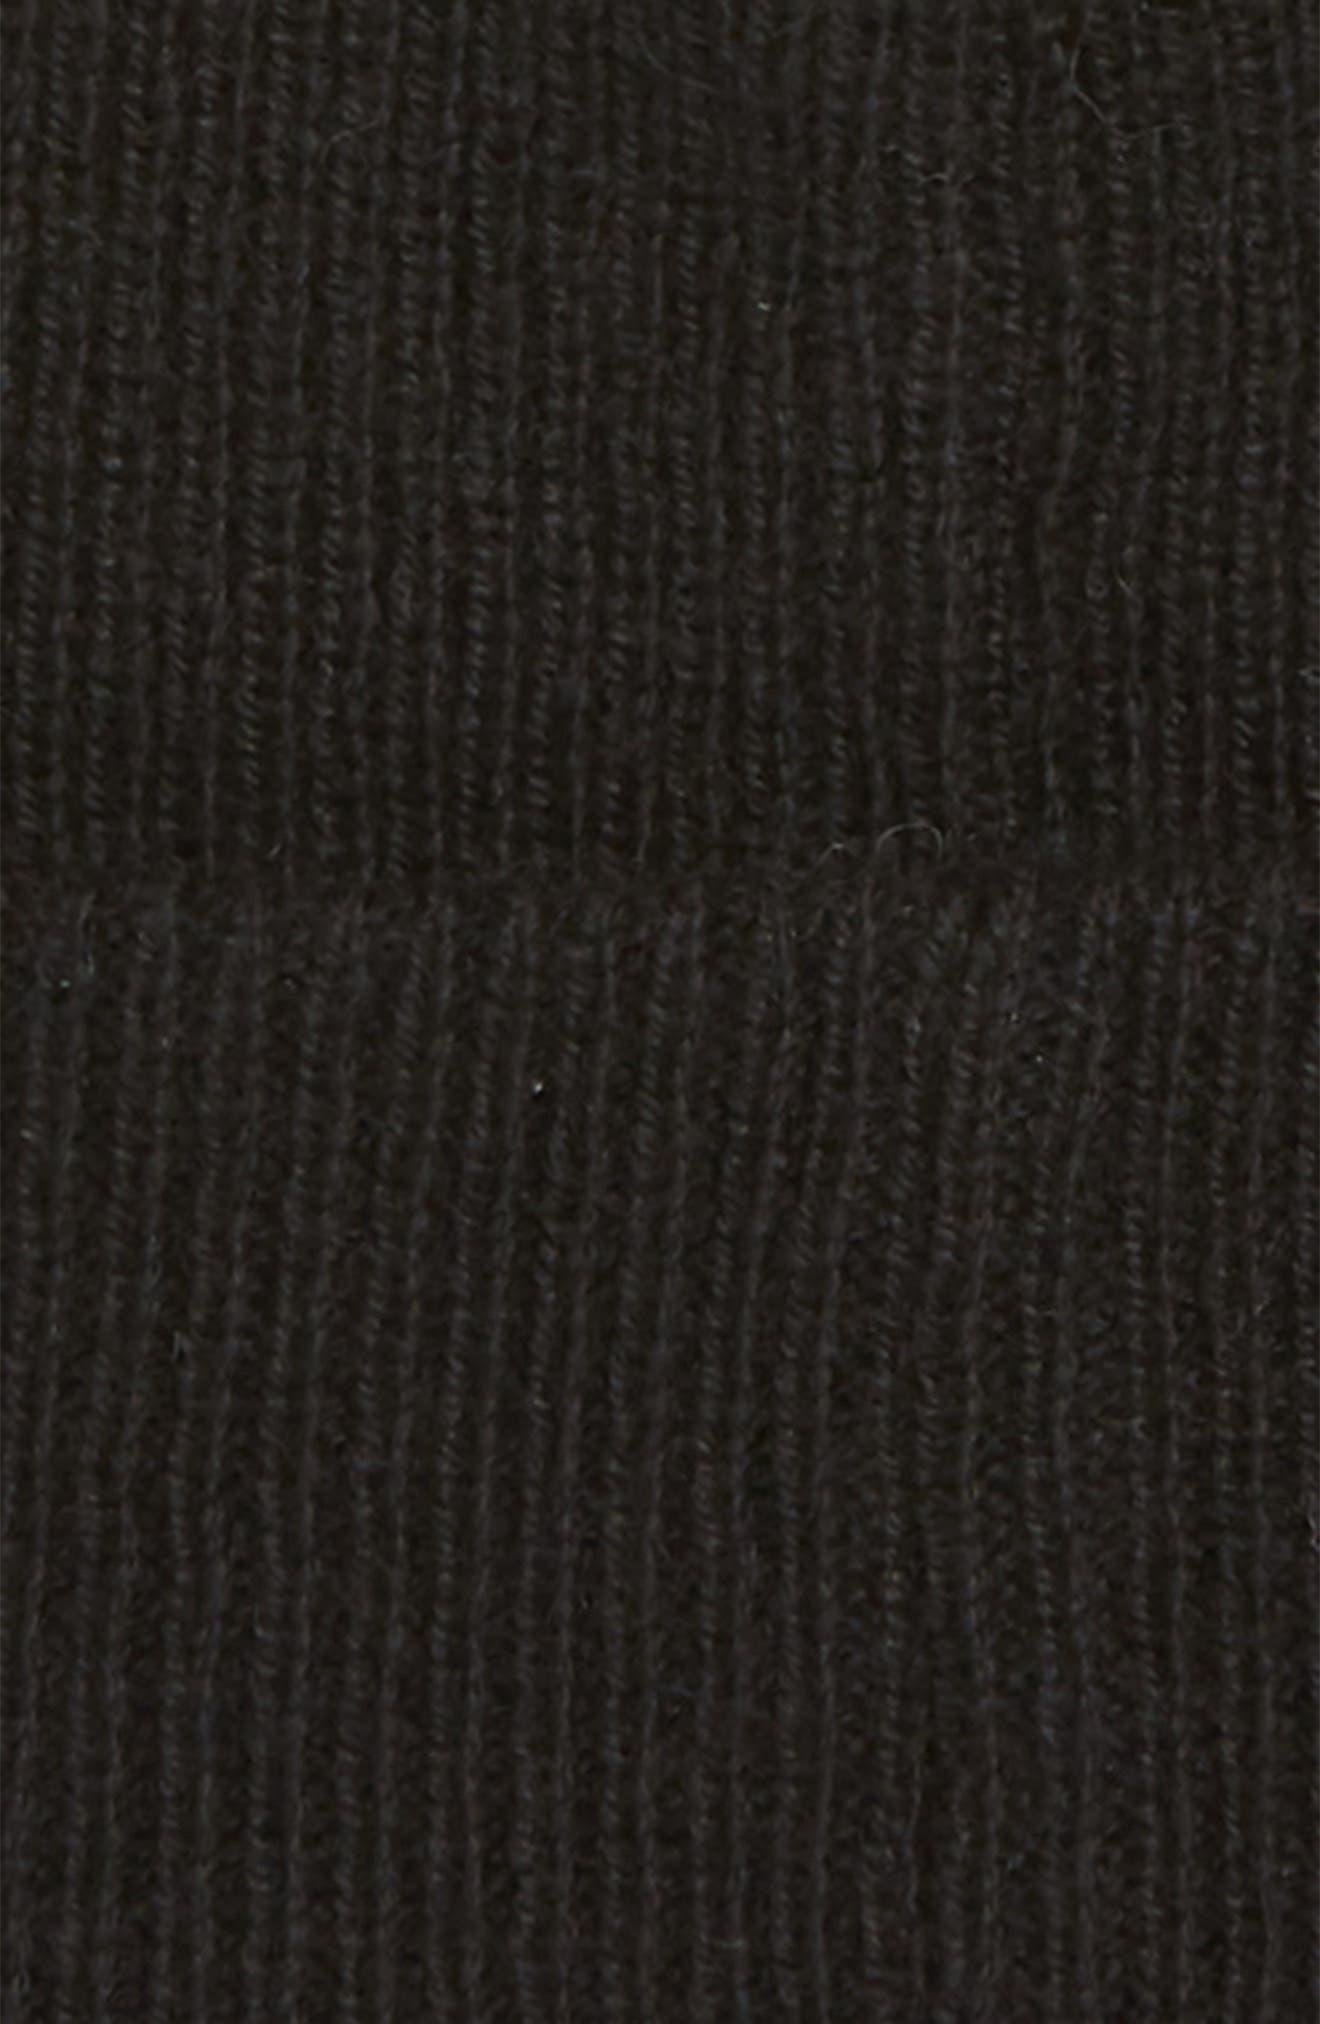 High Cuff Knit Wool & Cashmere Beanie,                             Alternate thumbnail 2, color,                             001